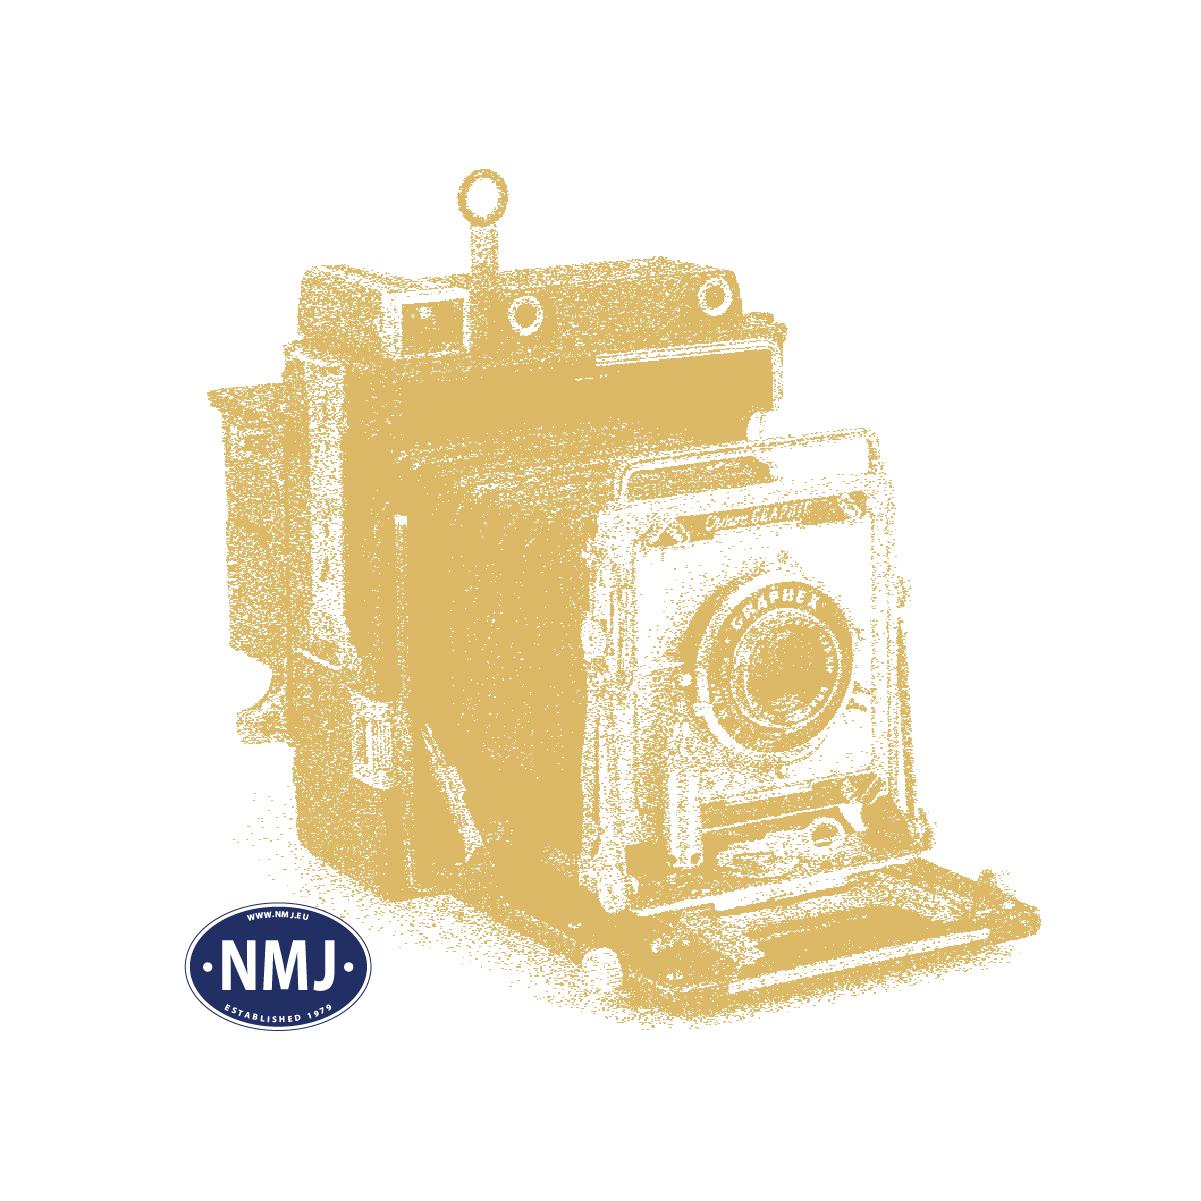 NMJT84.103 - NMJ Topline NSB BM69A.014, DC